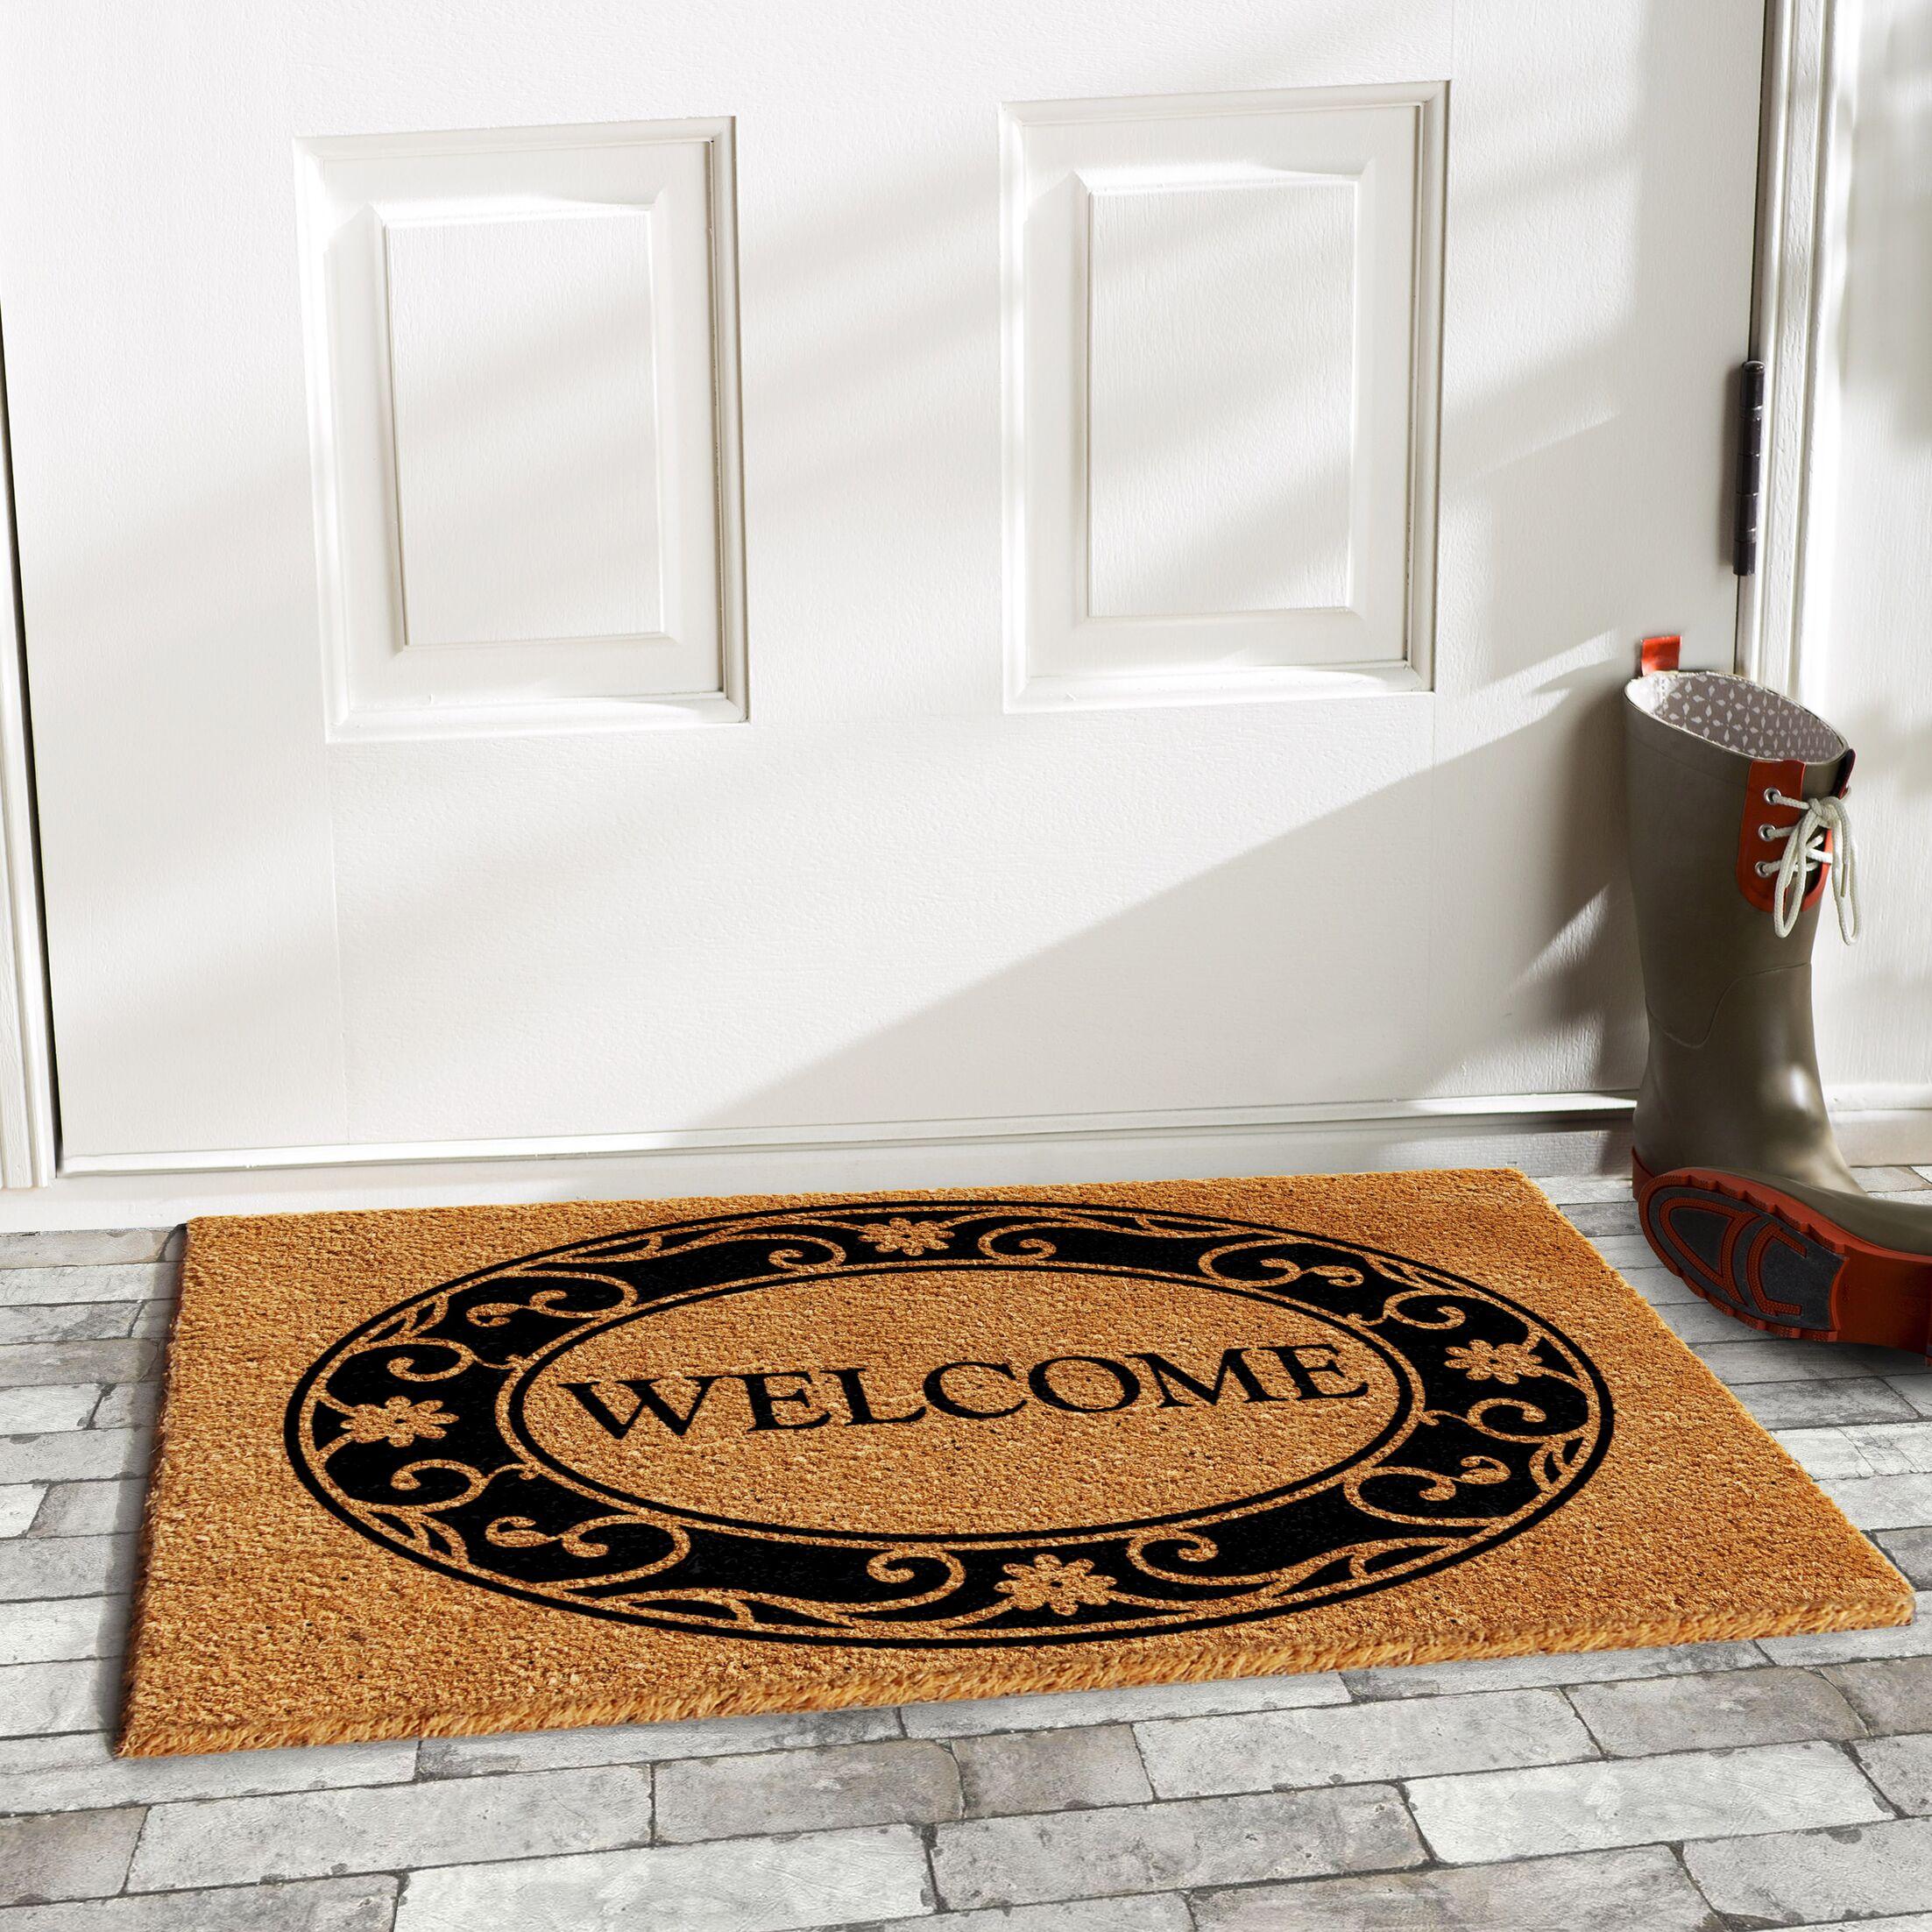 Hobson Welcome Doormat Mat Size: Rectangle 3' x 6'